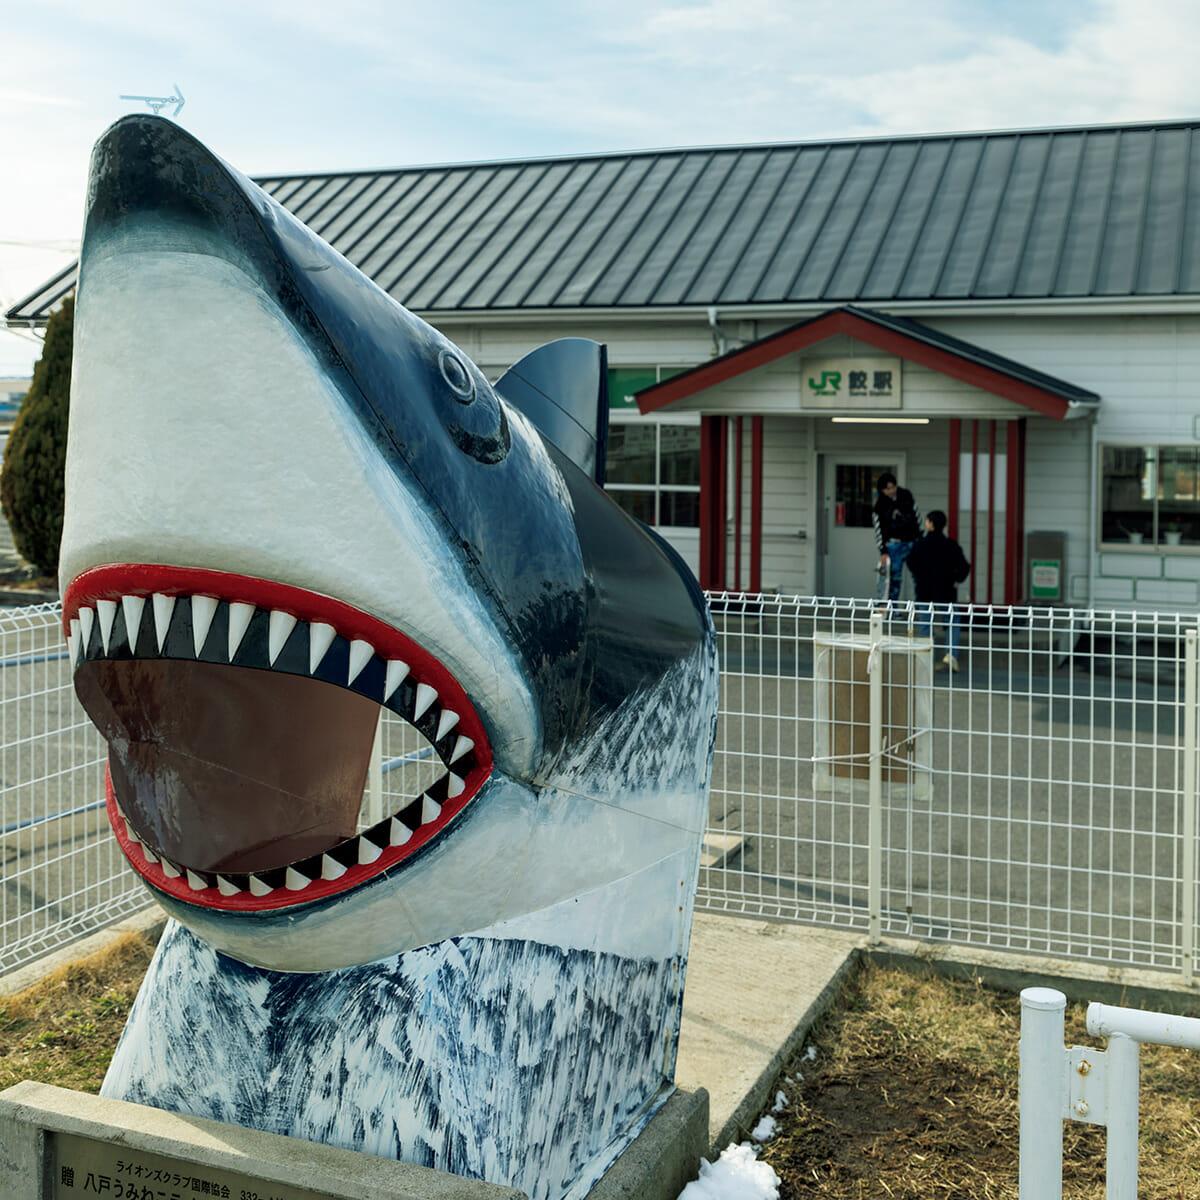 JR八戸線・鮫駅前にある鮫のオブジェ。ジョーズ気分で、記念撮影をどうぞ。